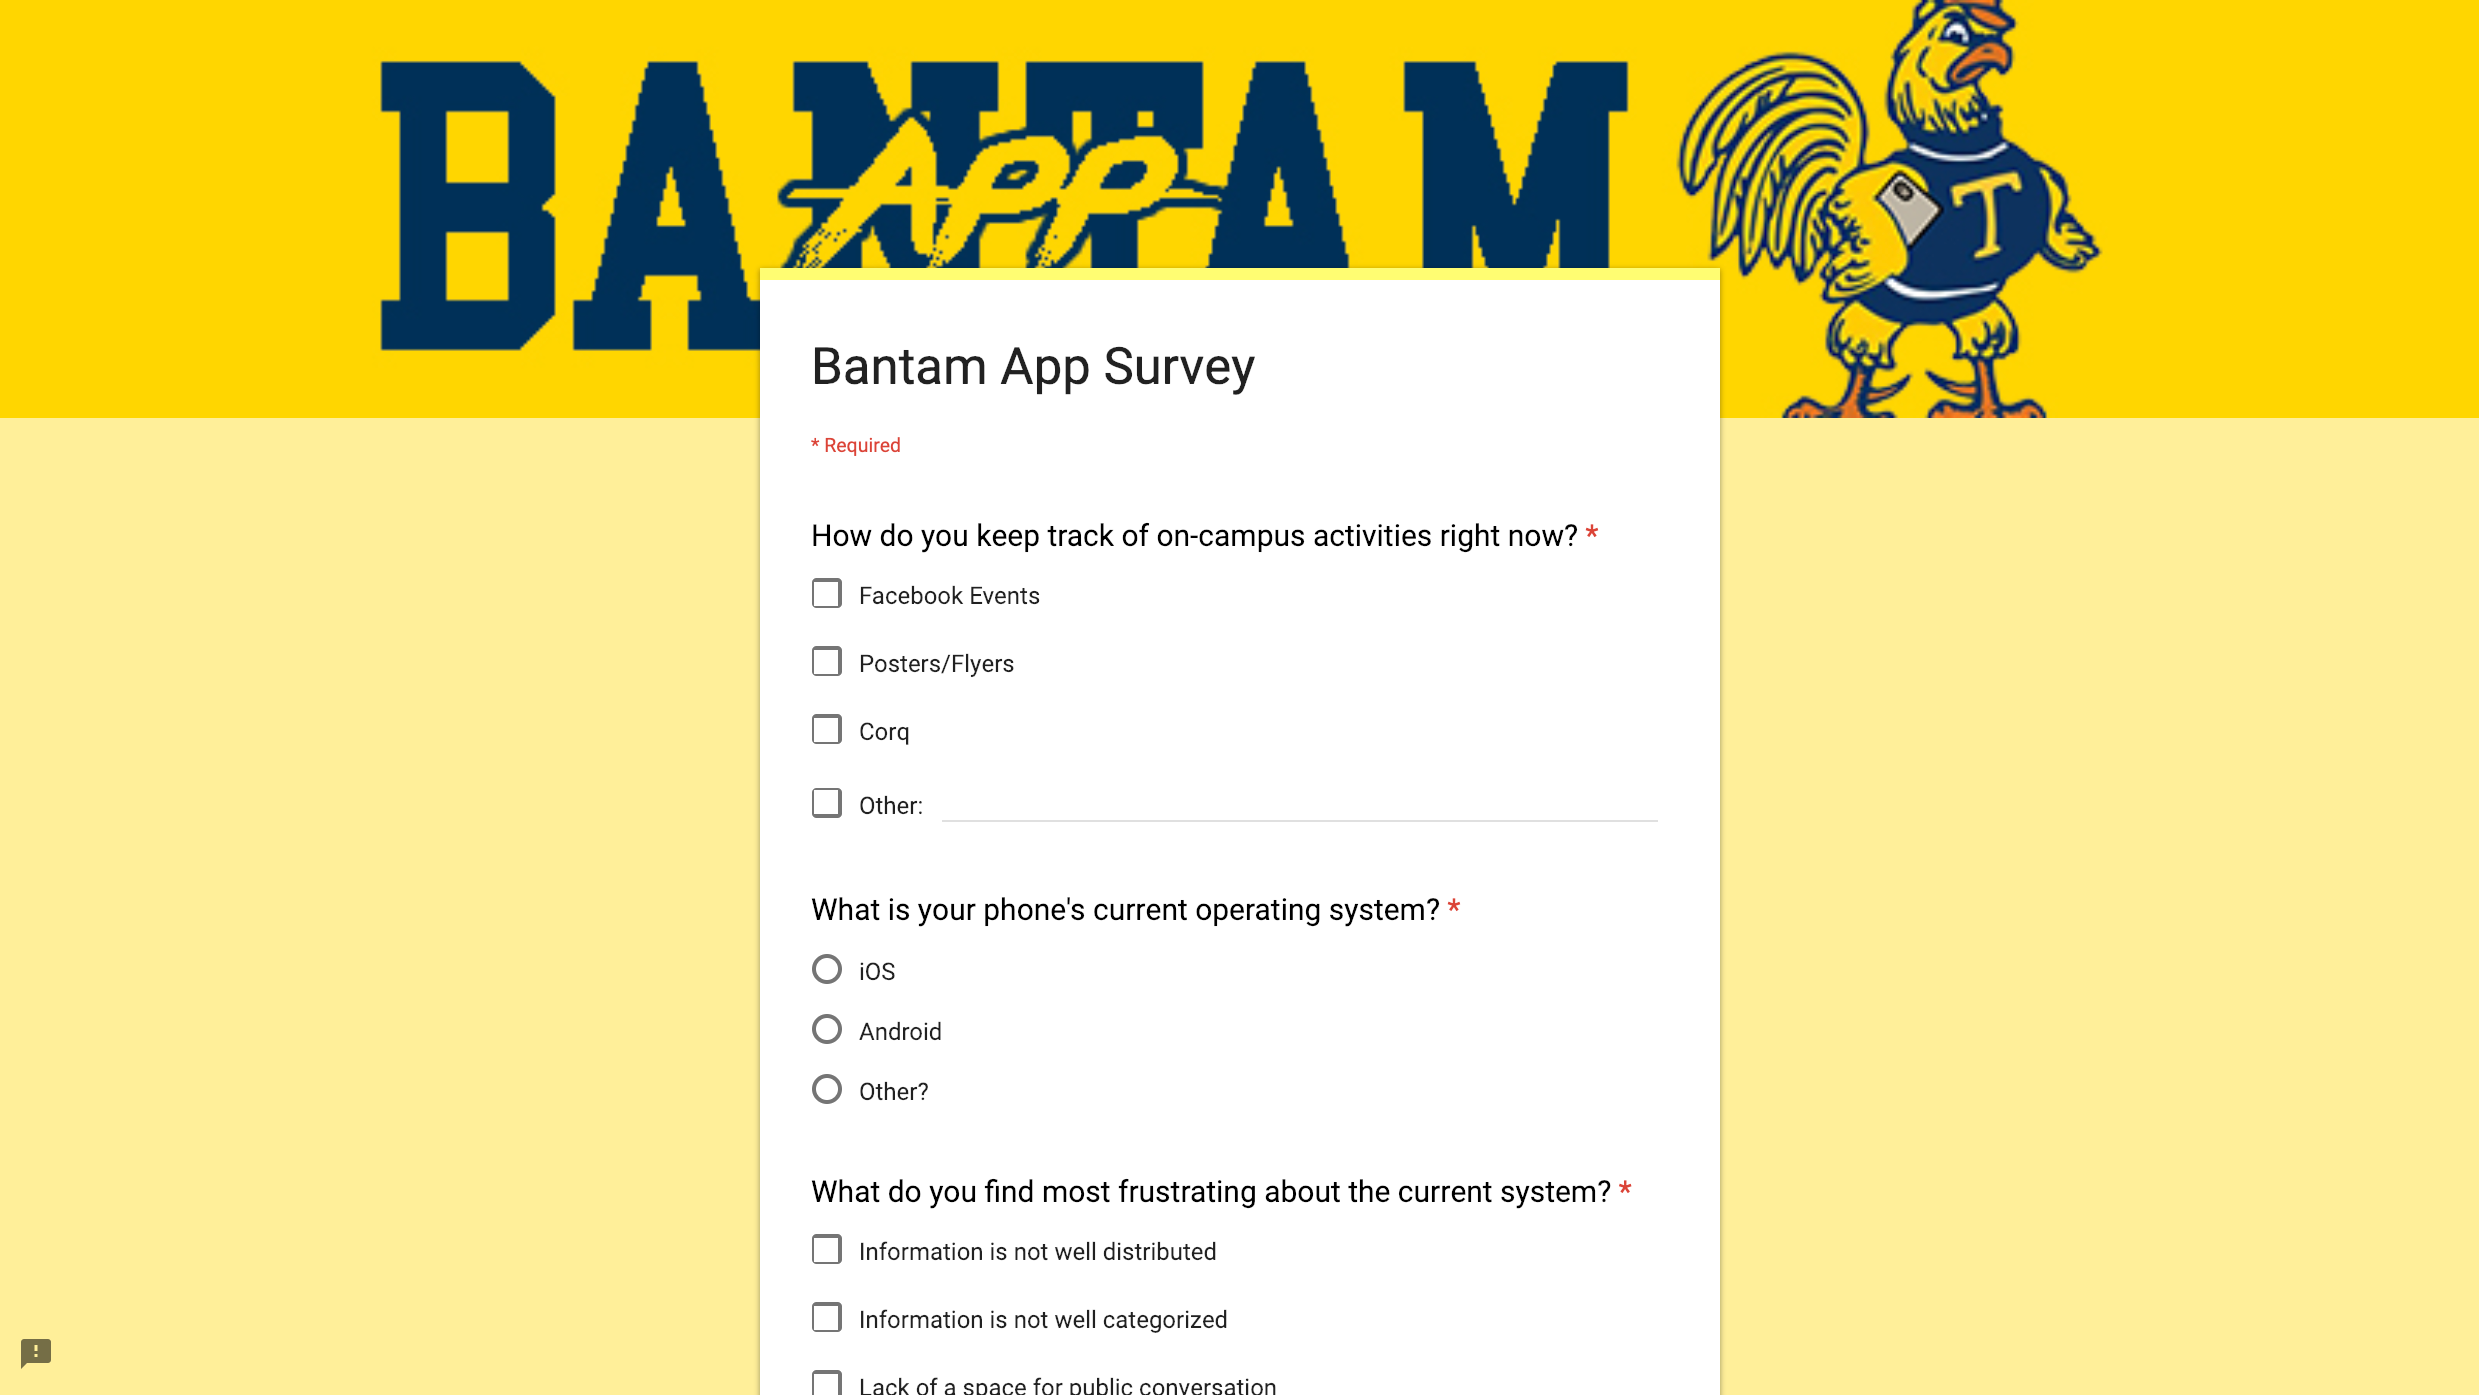 Bantam App Survey.png